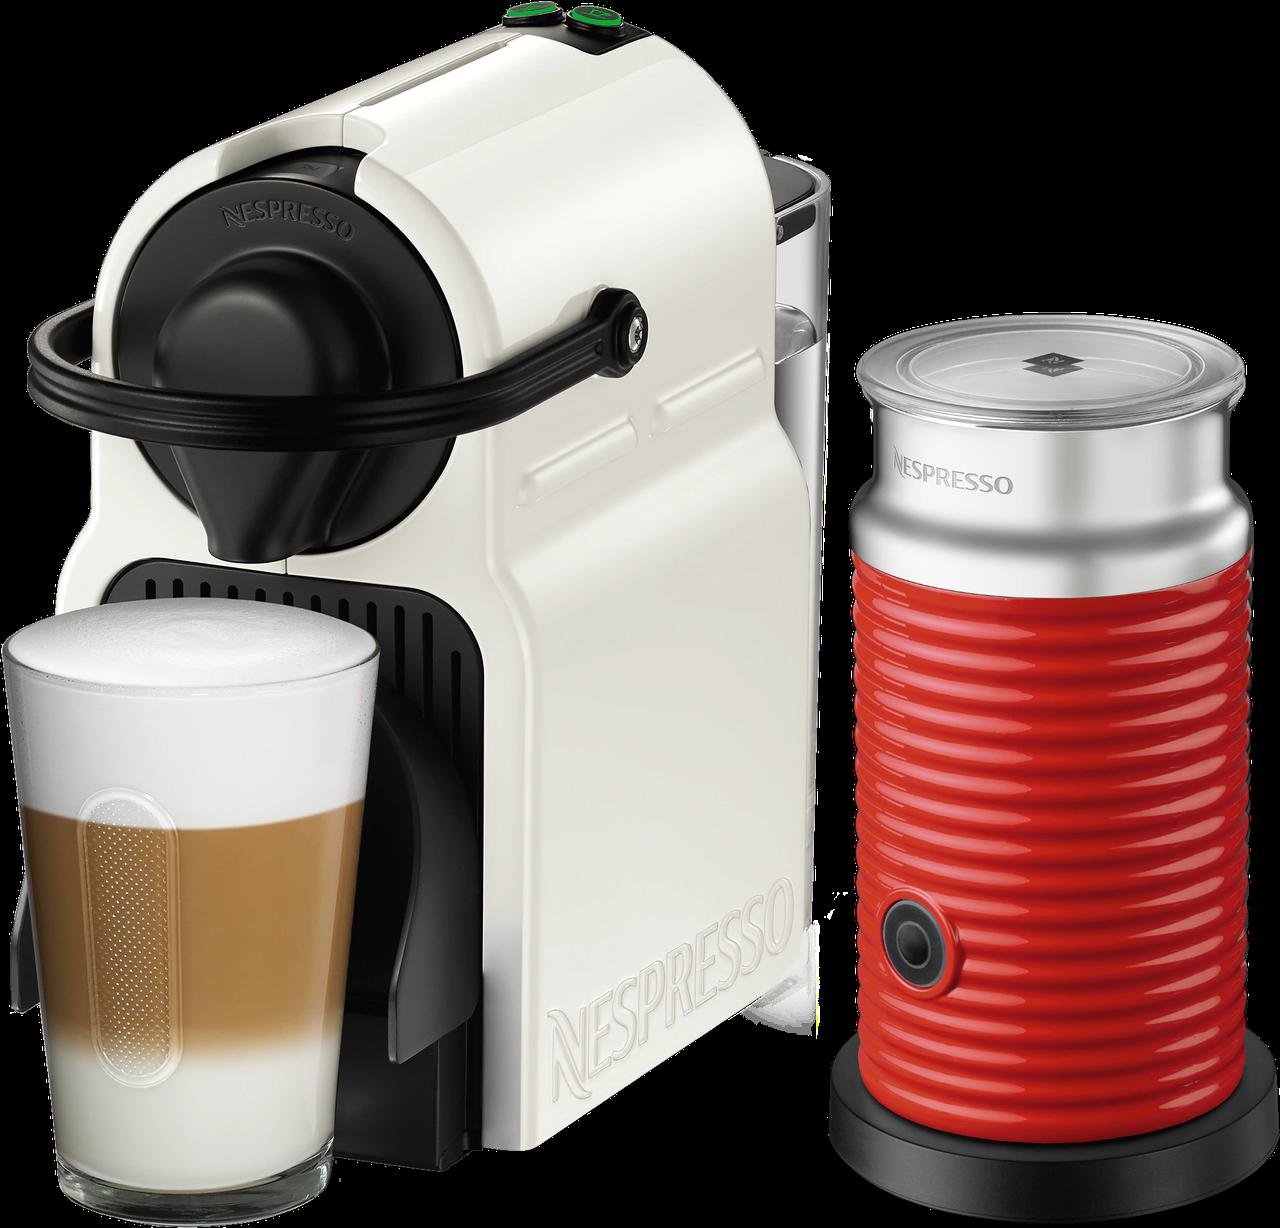 Кофемашина Nespresso Inissia White D40 & Aeroccino 3 Red + доставка бесплат+дегустационный набор (14 капсул)